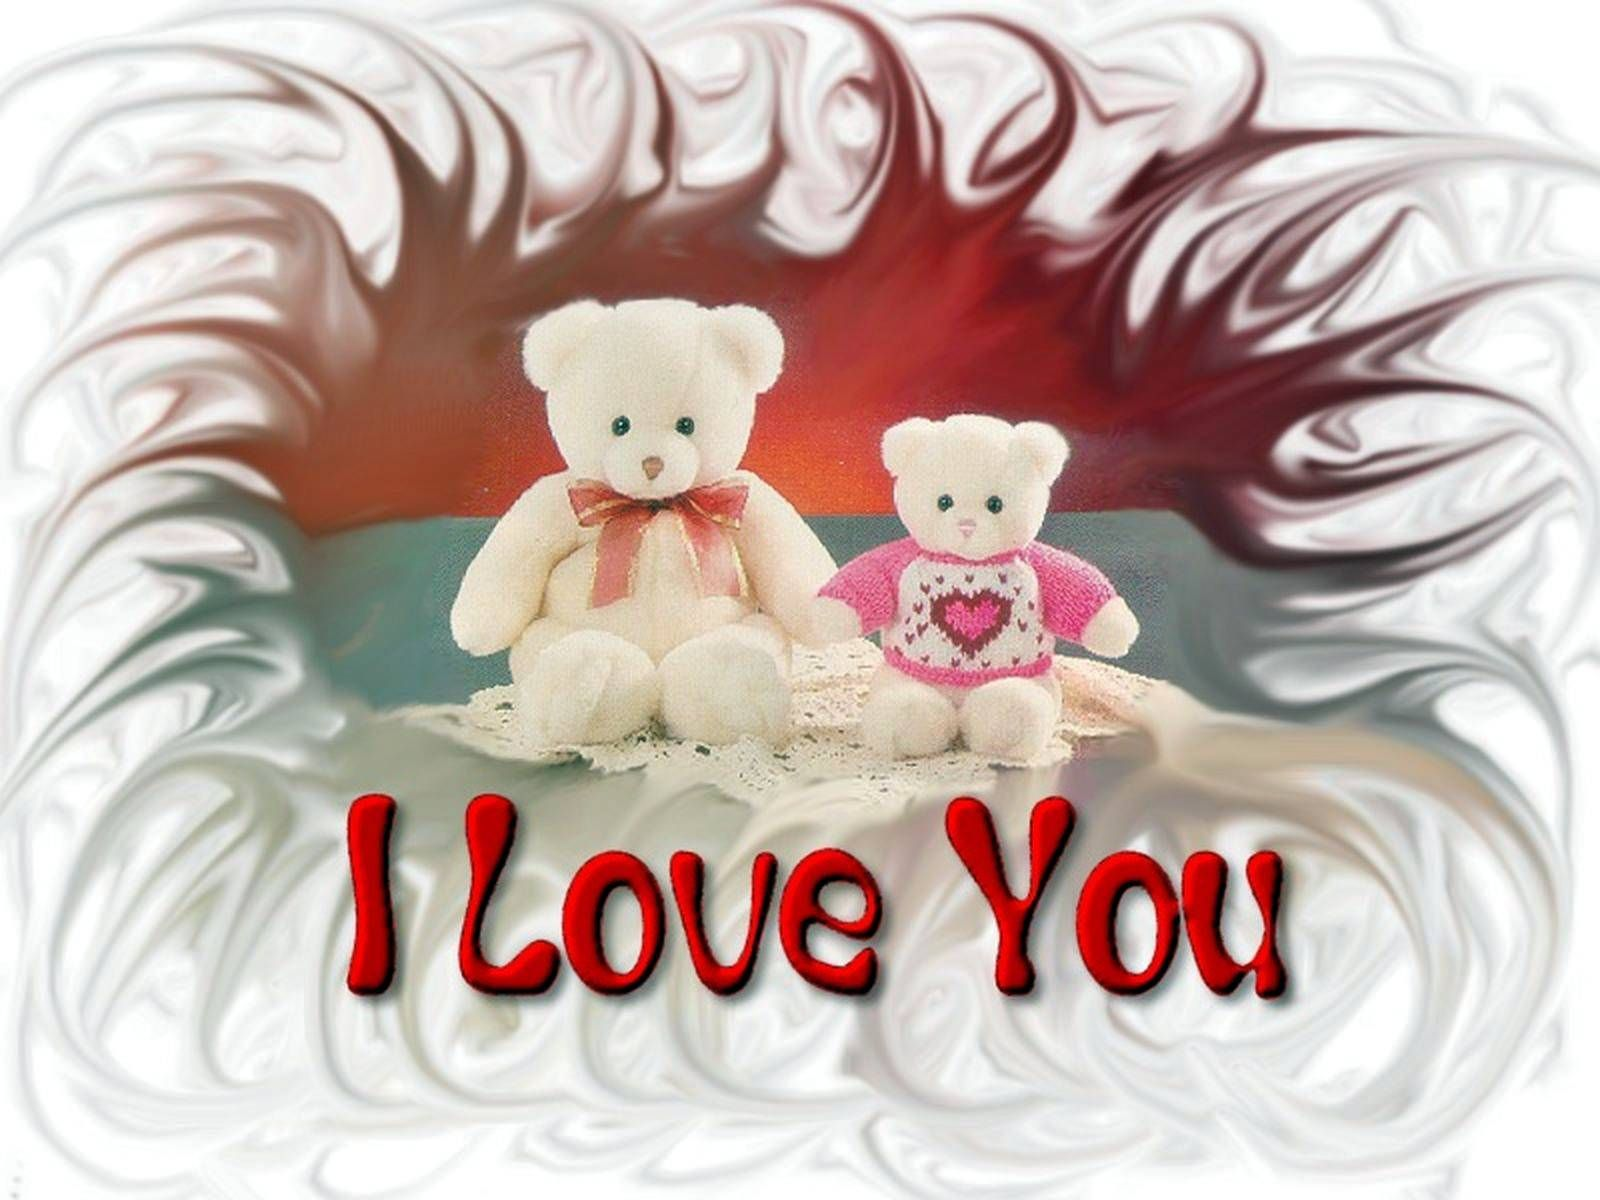 Beautiful Wallpaper Love Teddy Bear - 410e437b5fd1fa7d61823149976fd048  Perfect Image Reference_896410.jpg